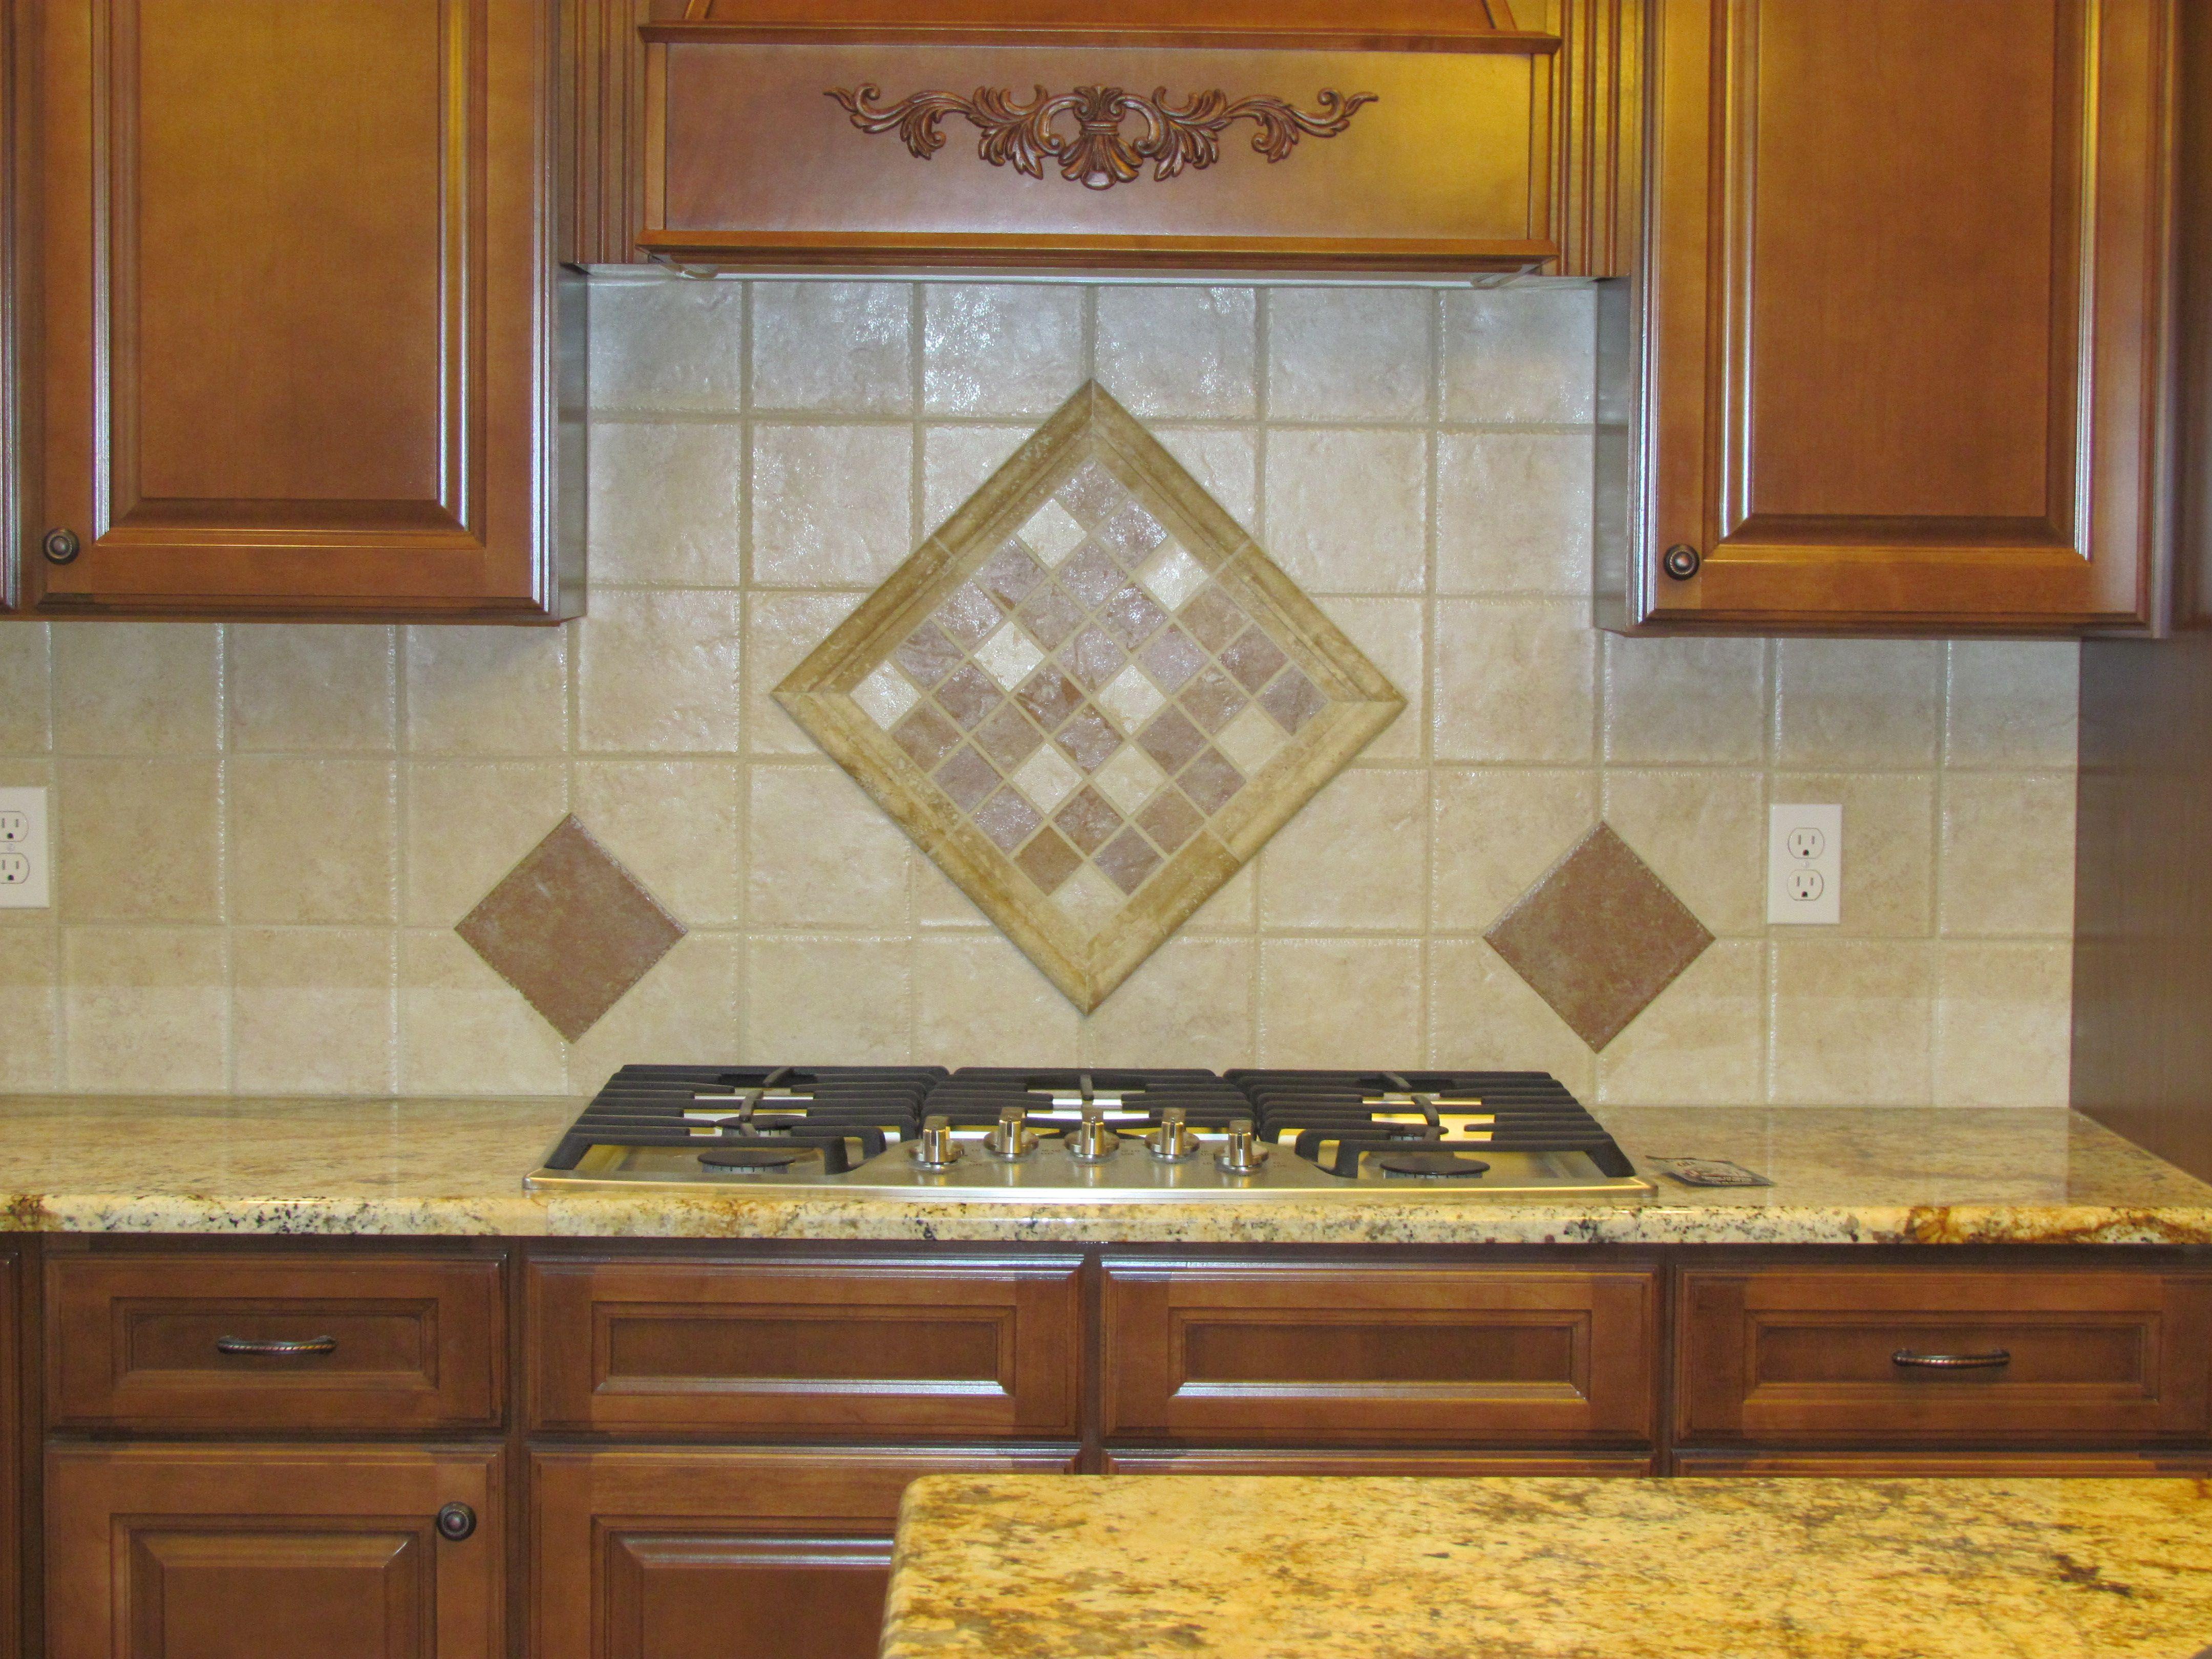 Tile Backsplash Peoria Il Kitchen Tile Backsplash Home Decor